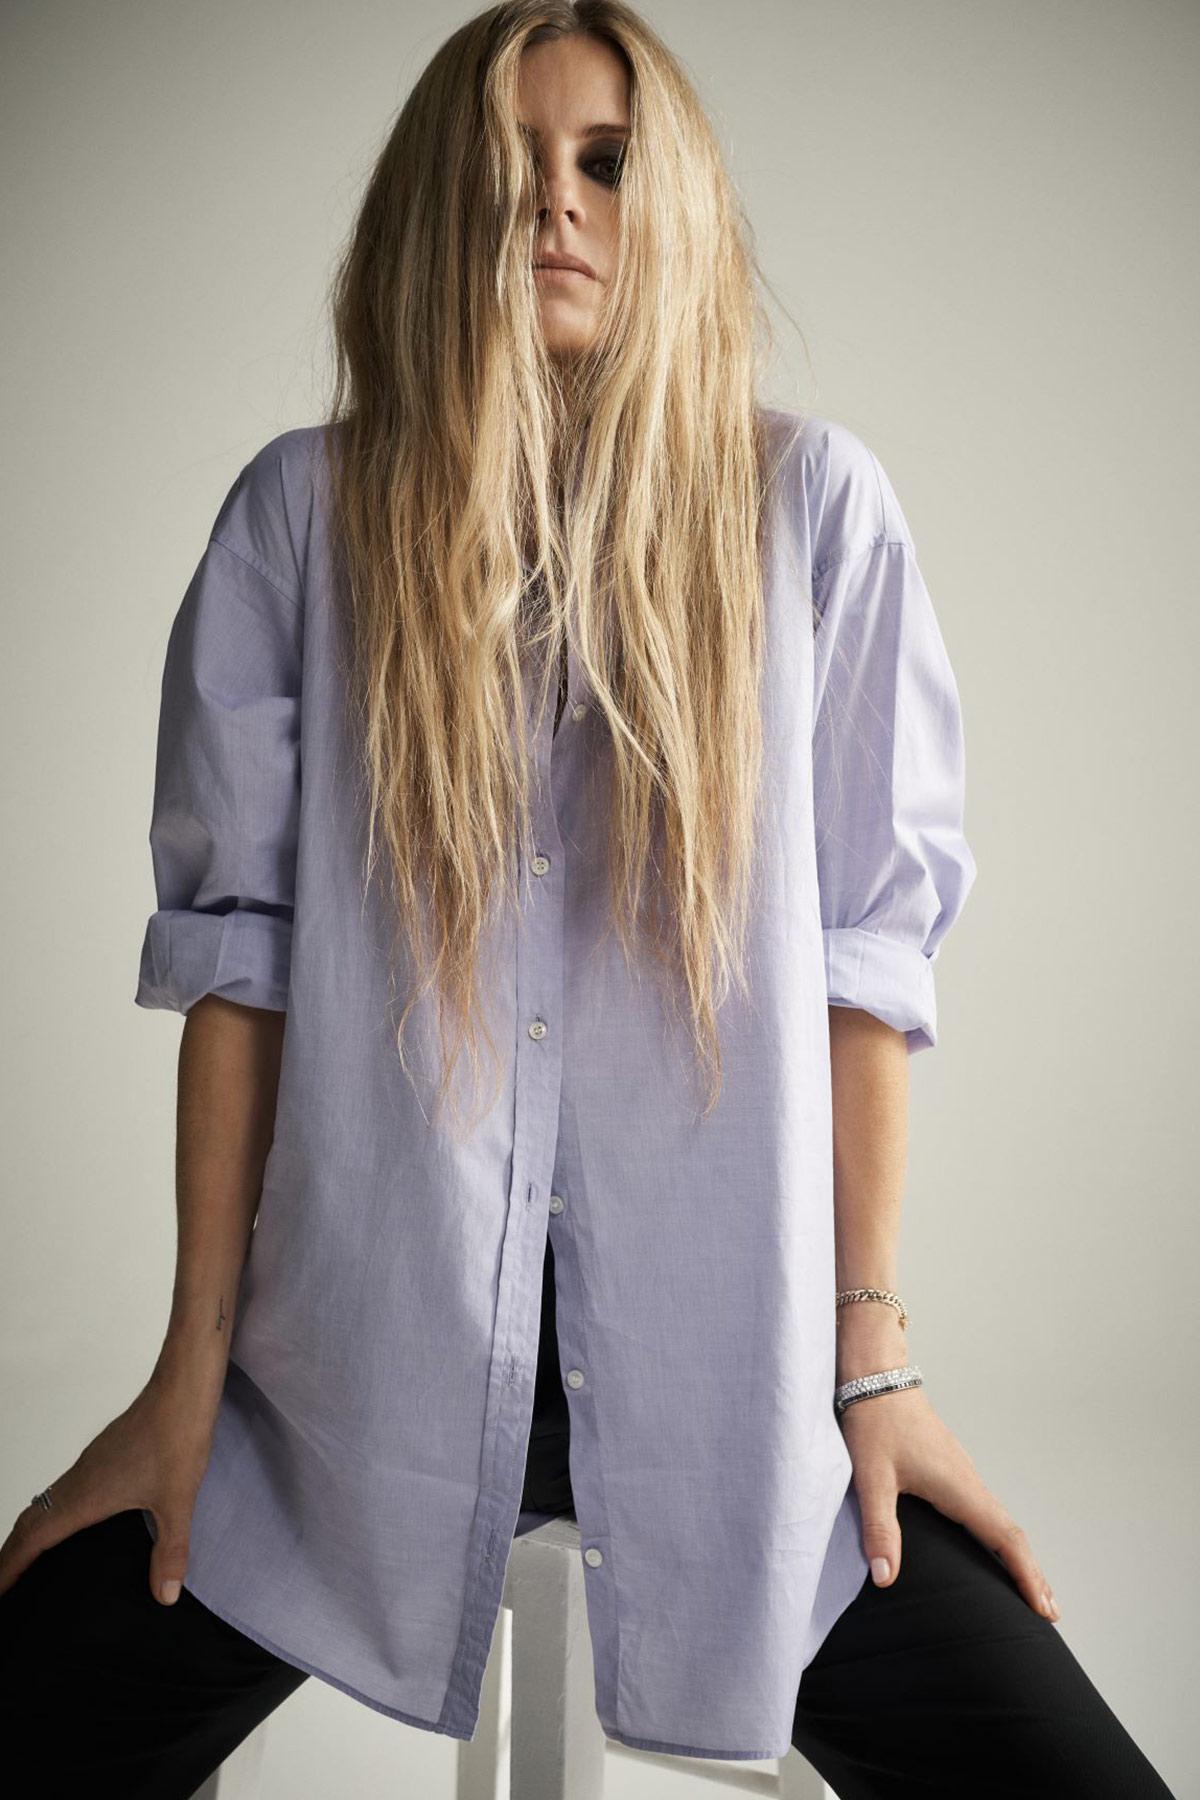 Laura Bailey in Luxor Shirt